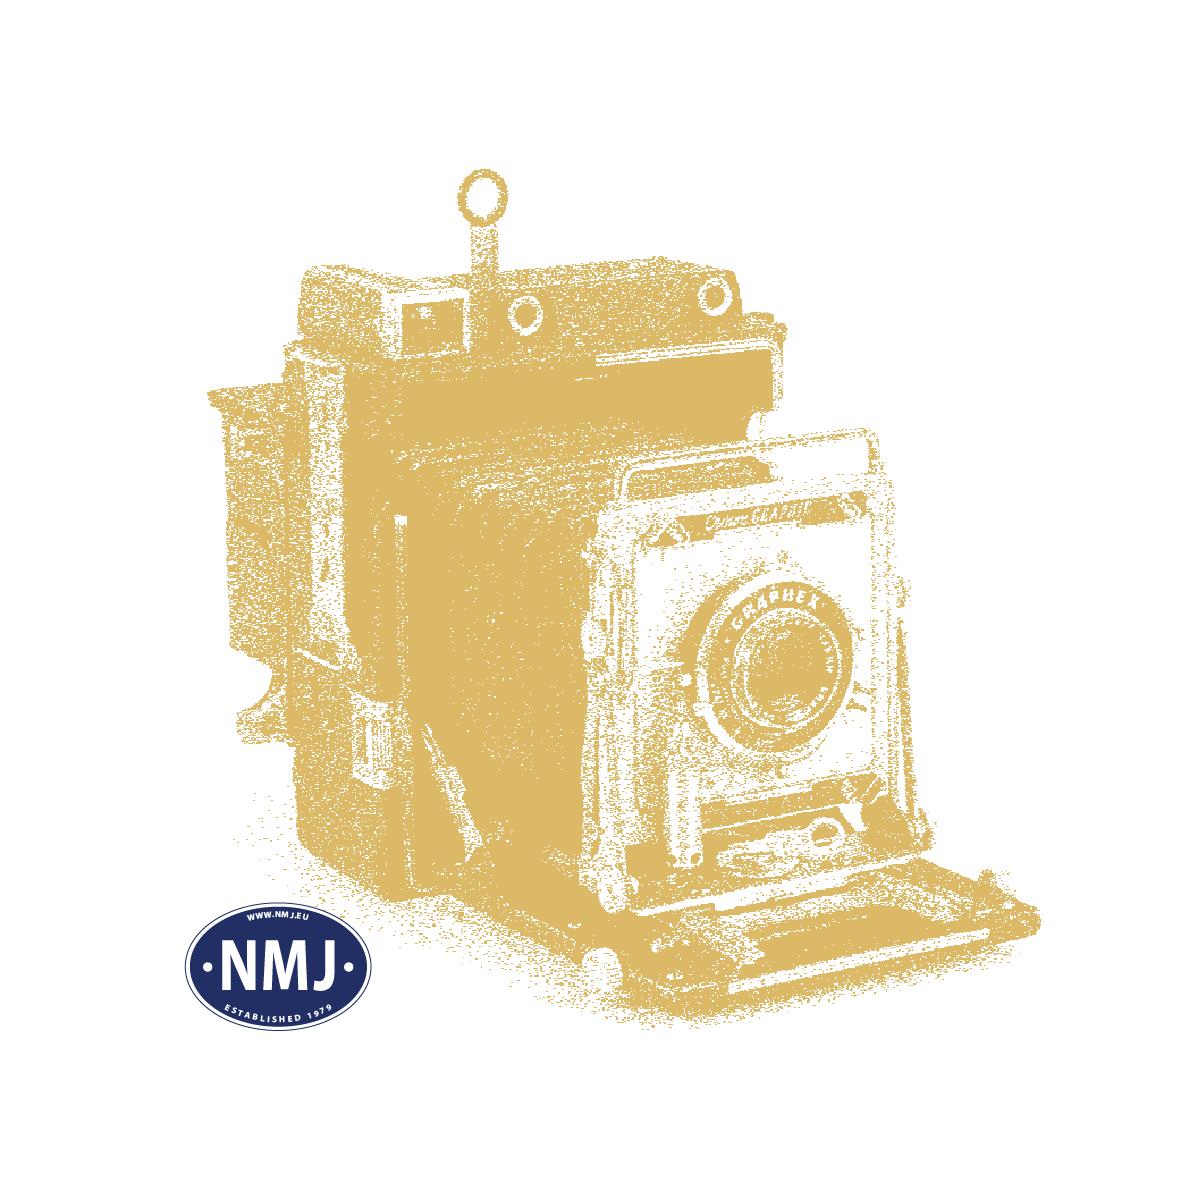 DK-H0-L0002AL - HFHJ MX 19, AC m/ Sound